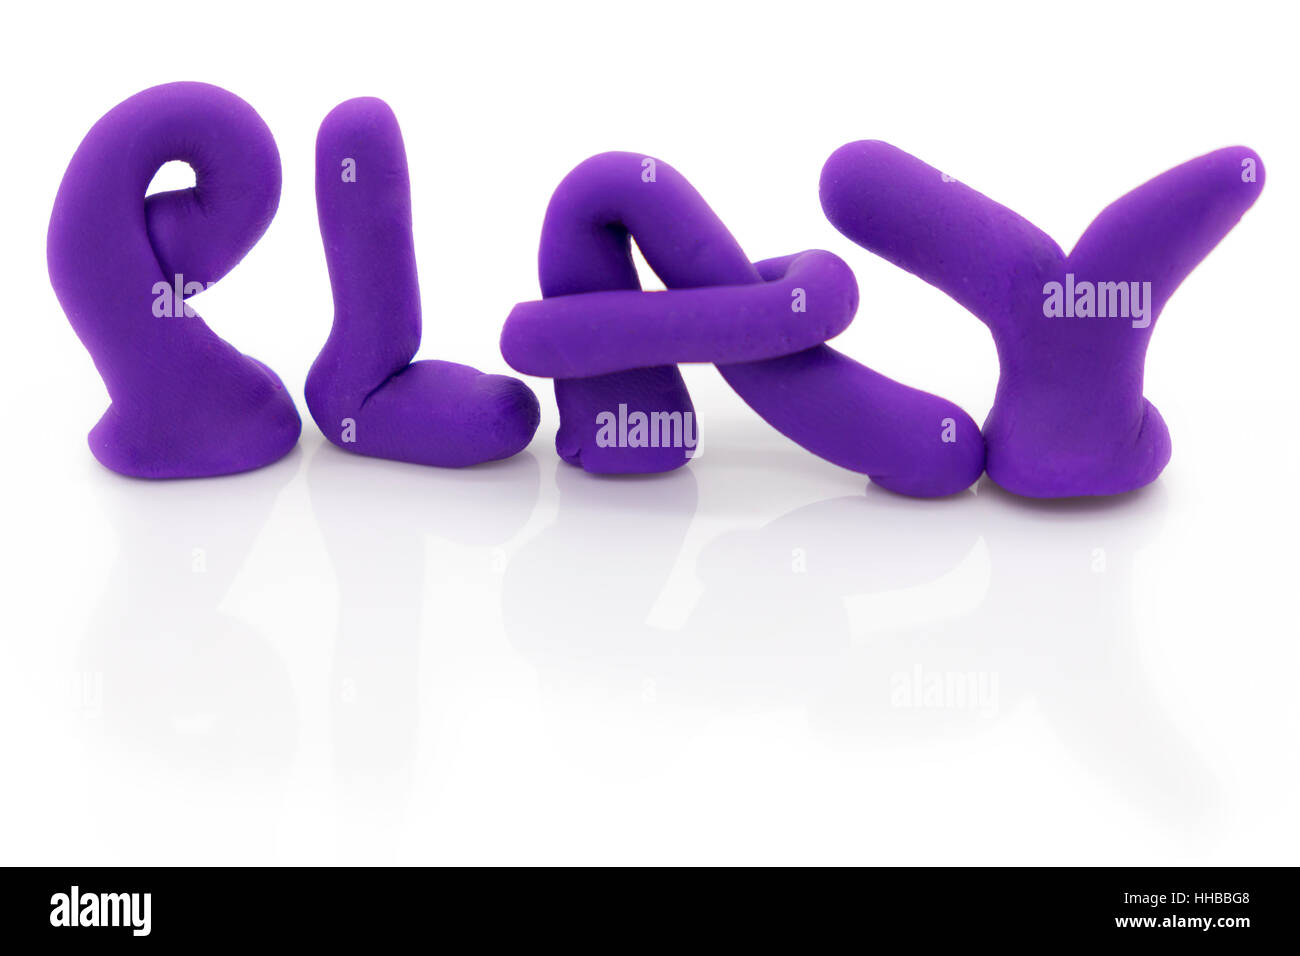 Play - Stock Image